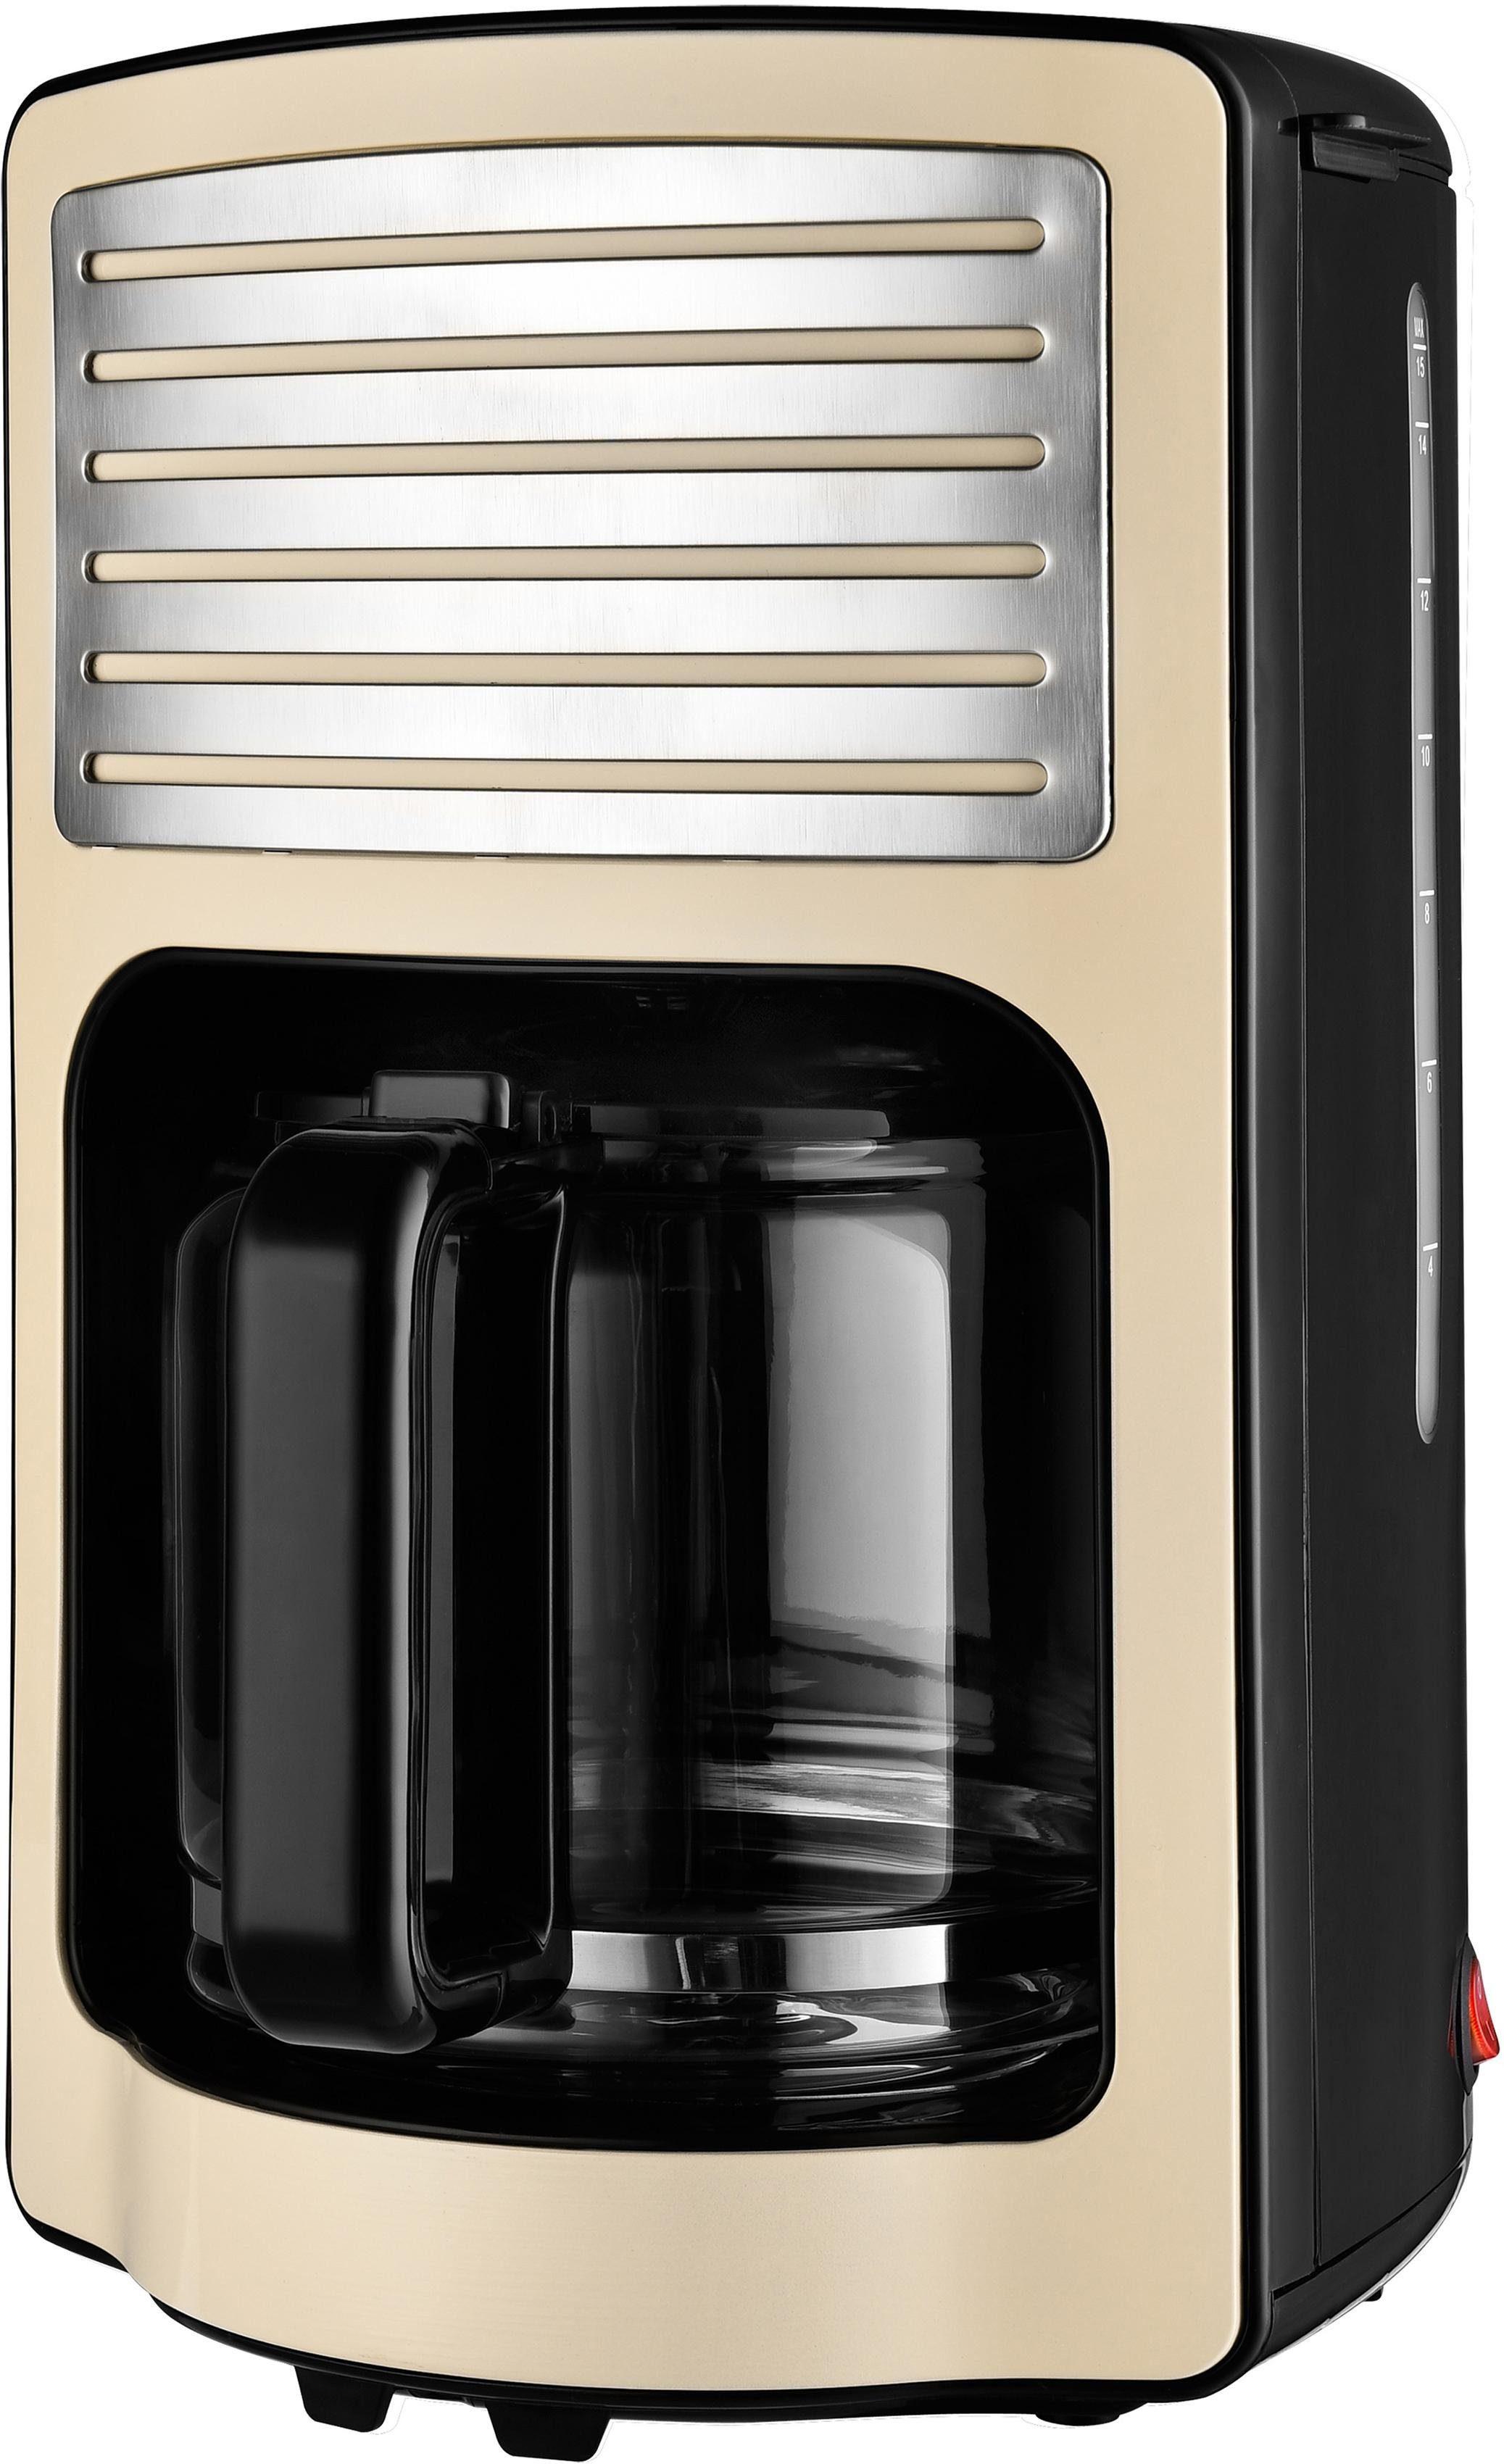 Team Kalorik Filterkaffeemaschine RETRO Kaffeeautomat TKG CM 2500 B, Papierfilter 1x4